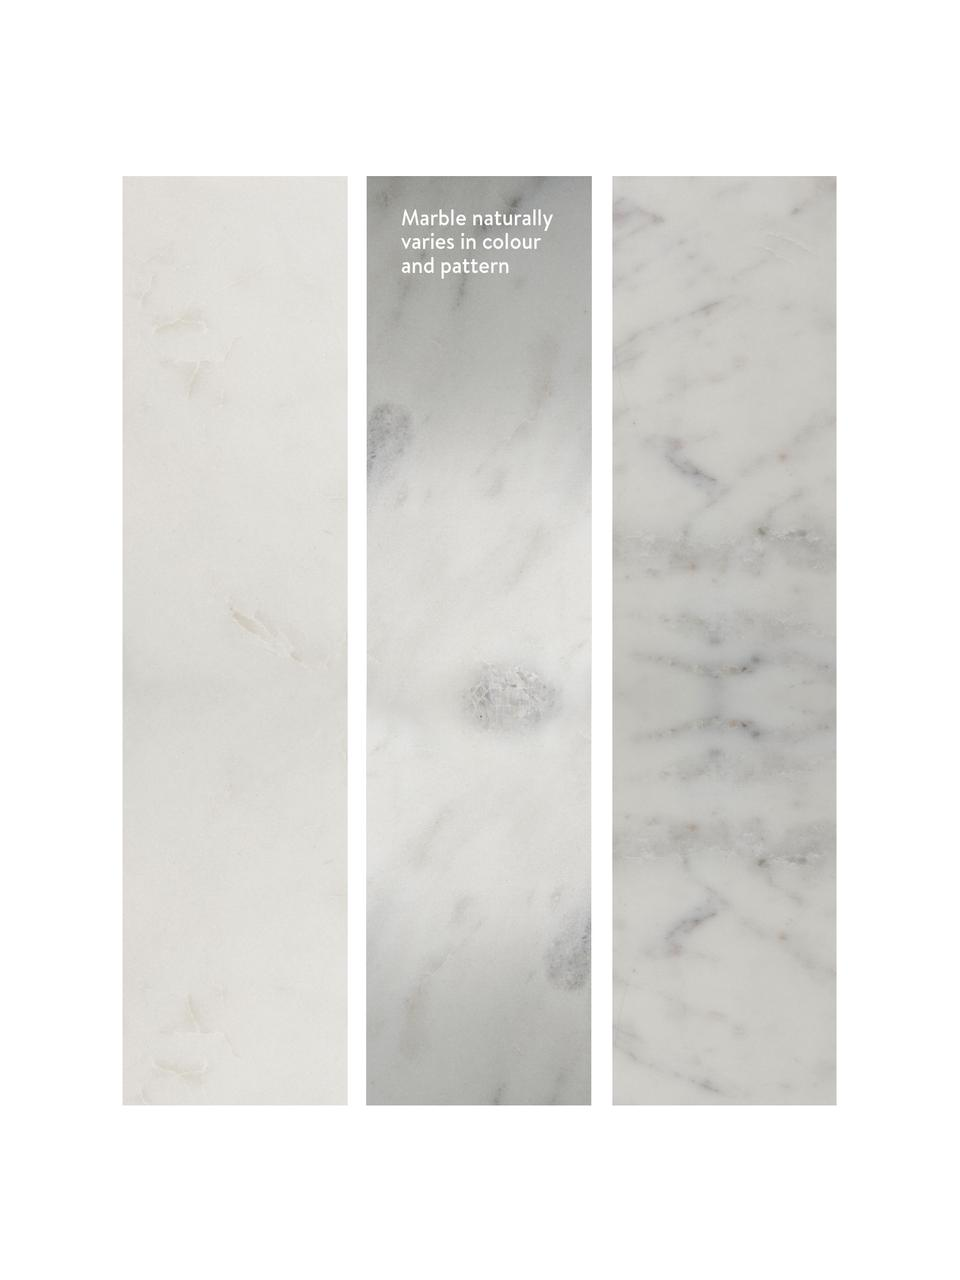 Grande table basse en marbreAlys, Marbre blanc, couleur dorée